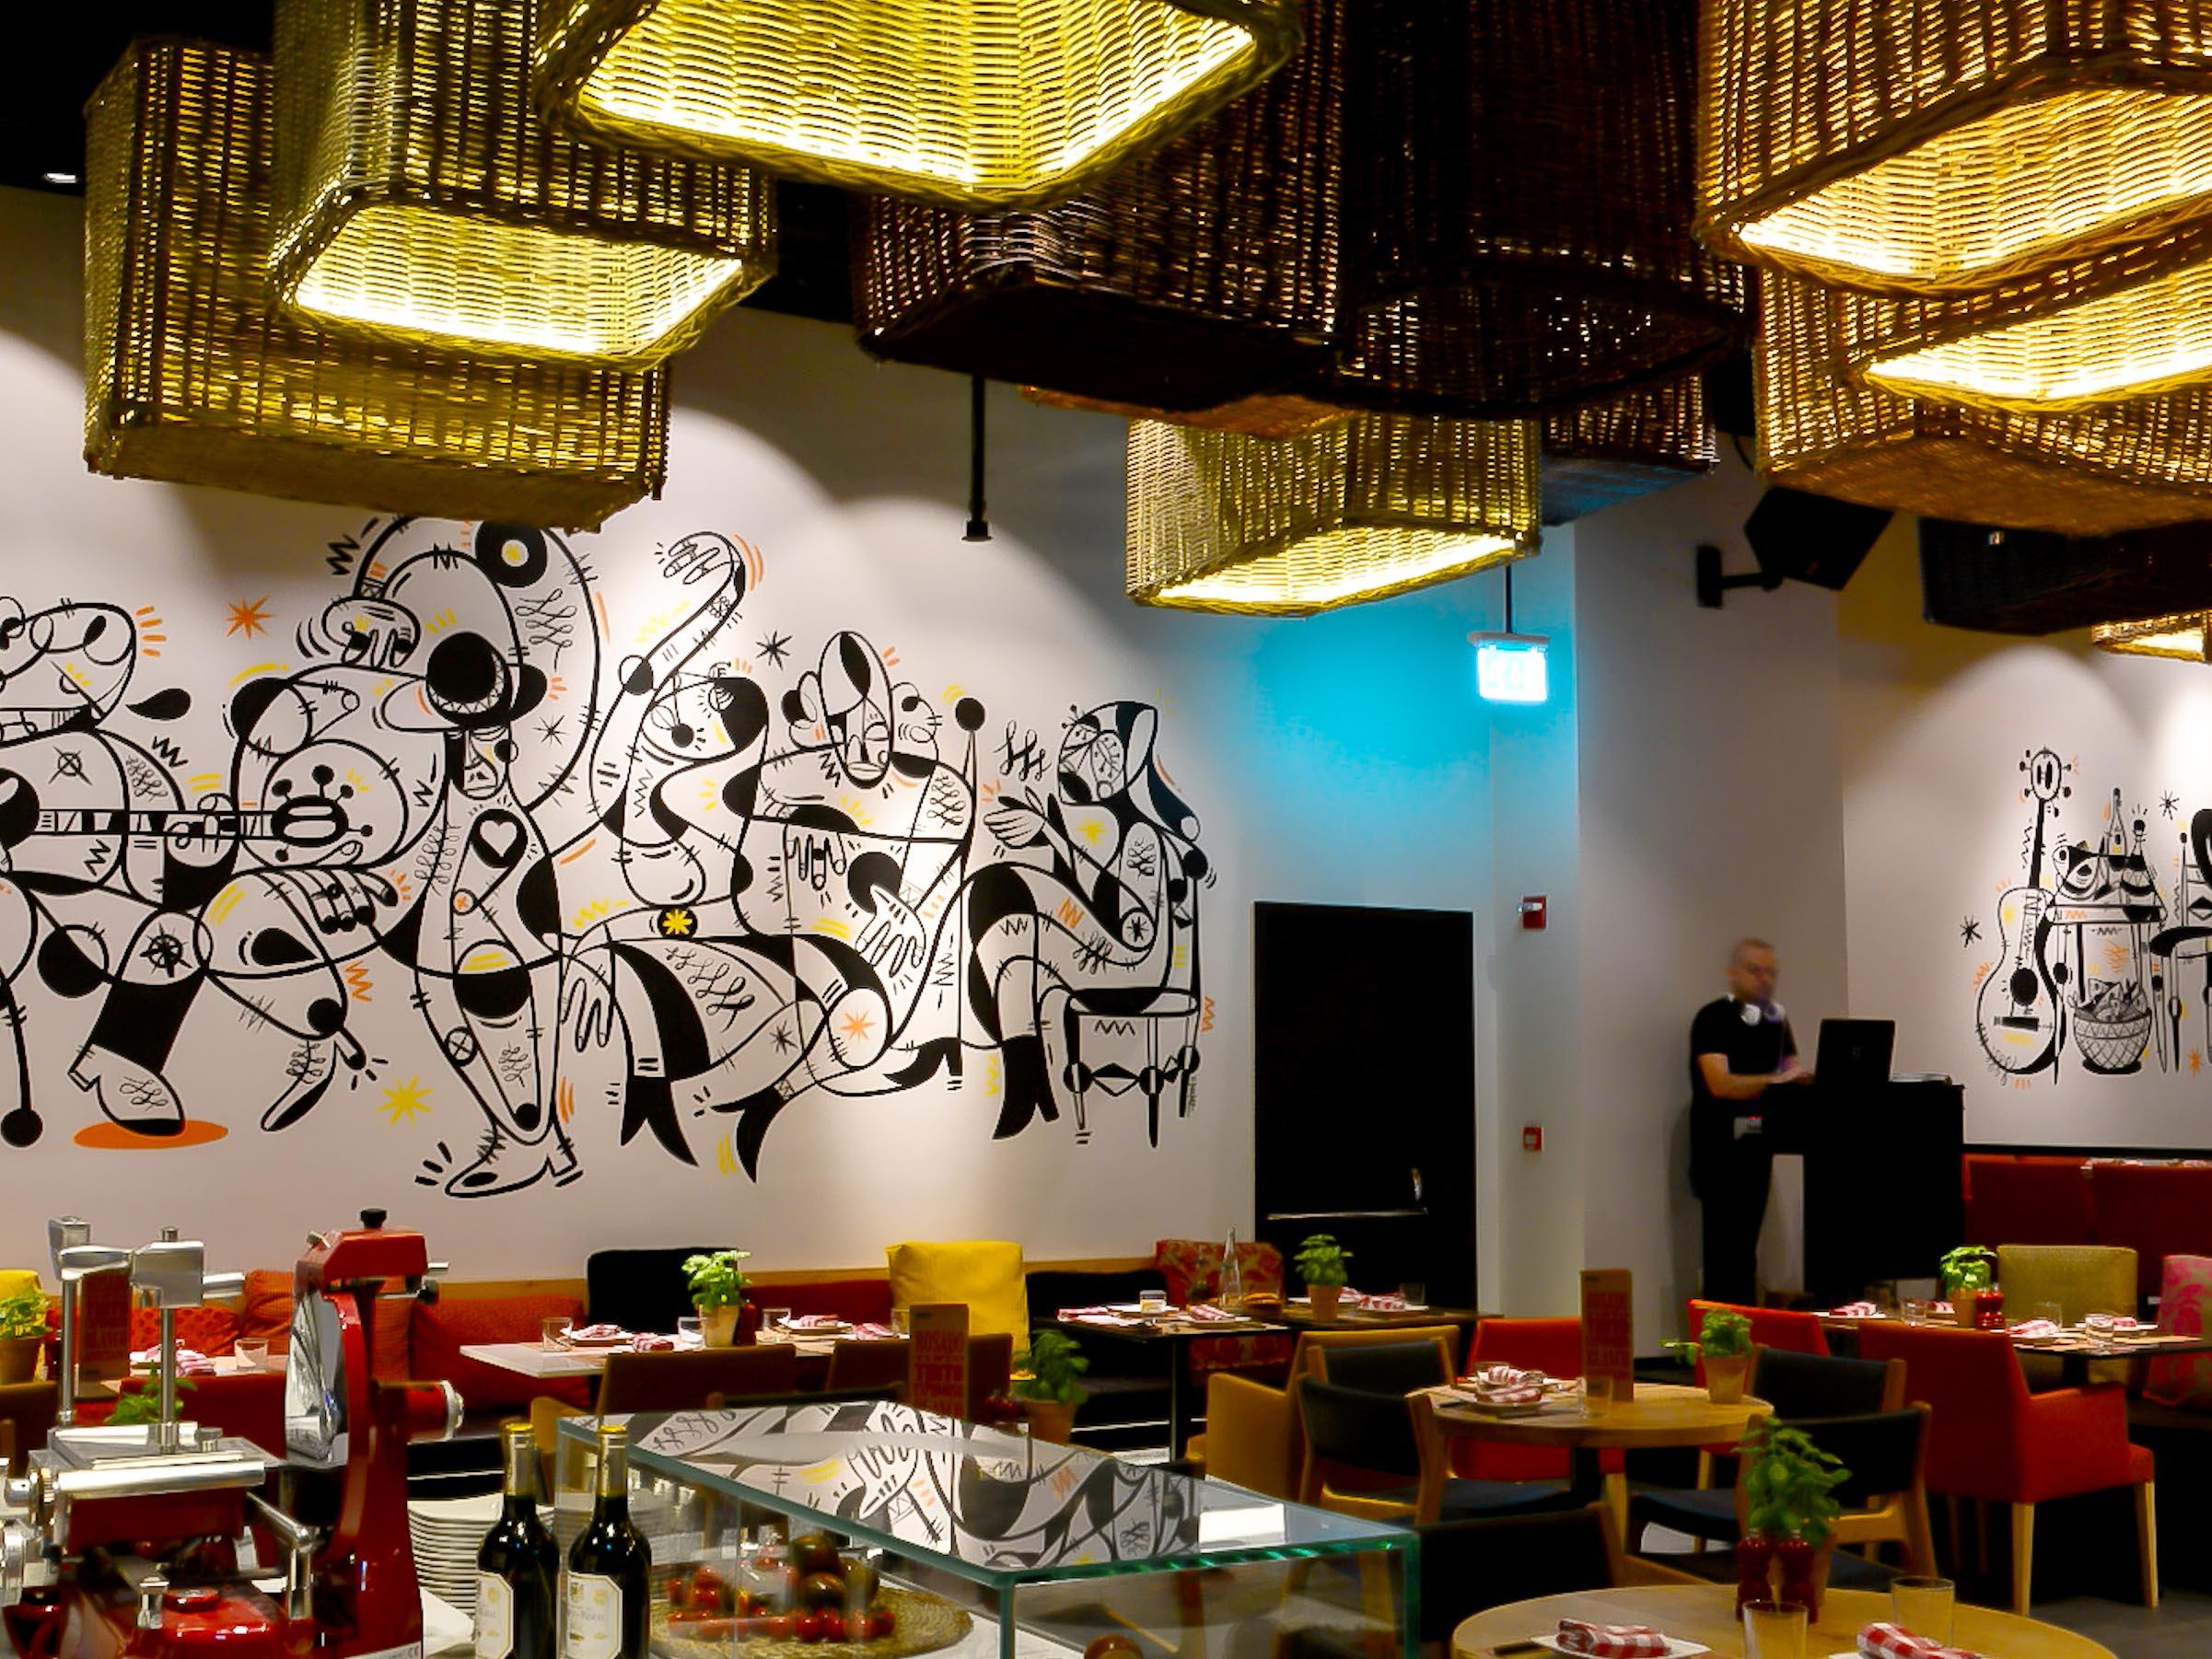 02-capsule-arts-projects-salero-tapas-bodega-restaurant.jpg